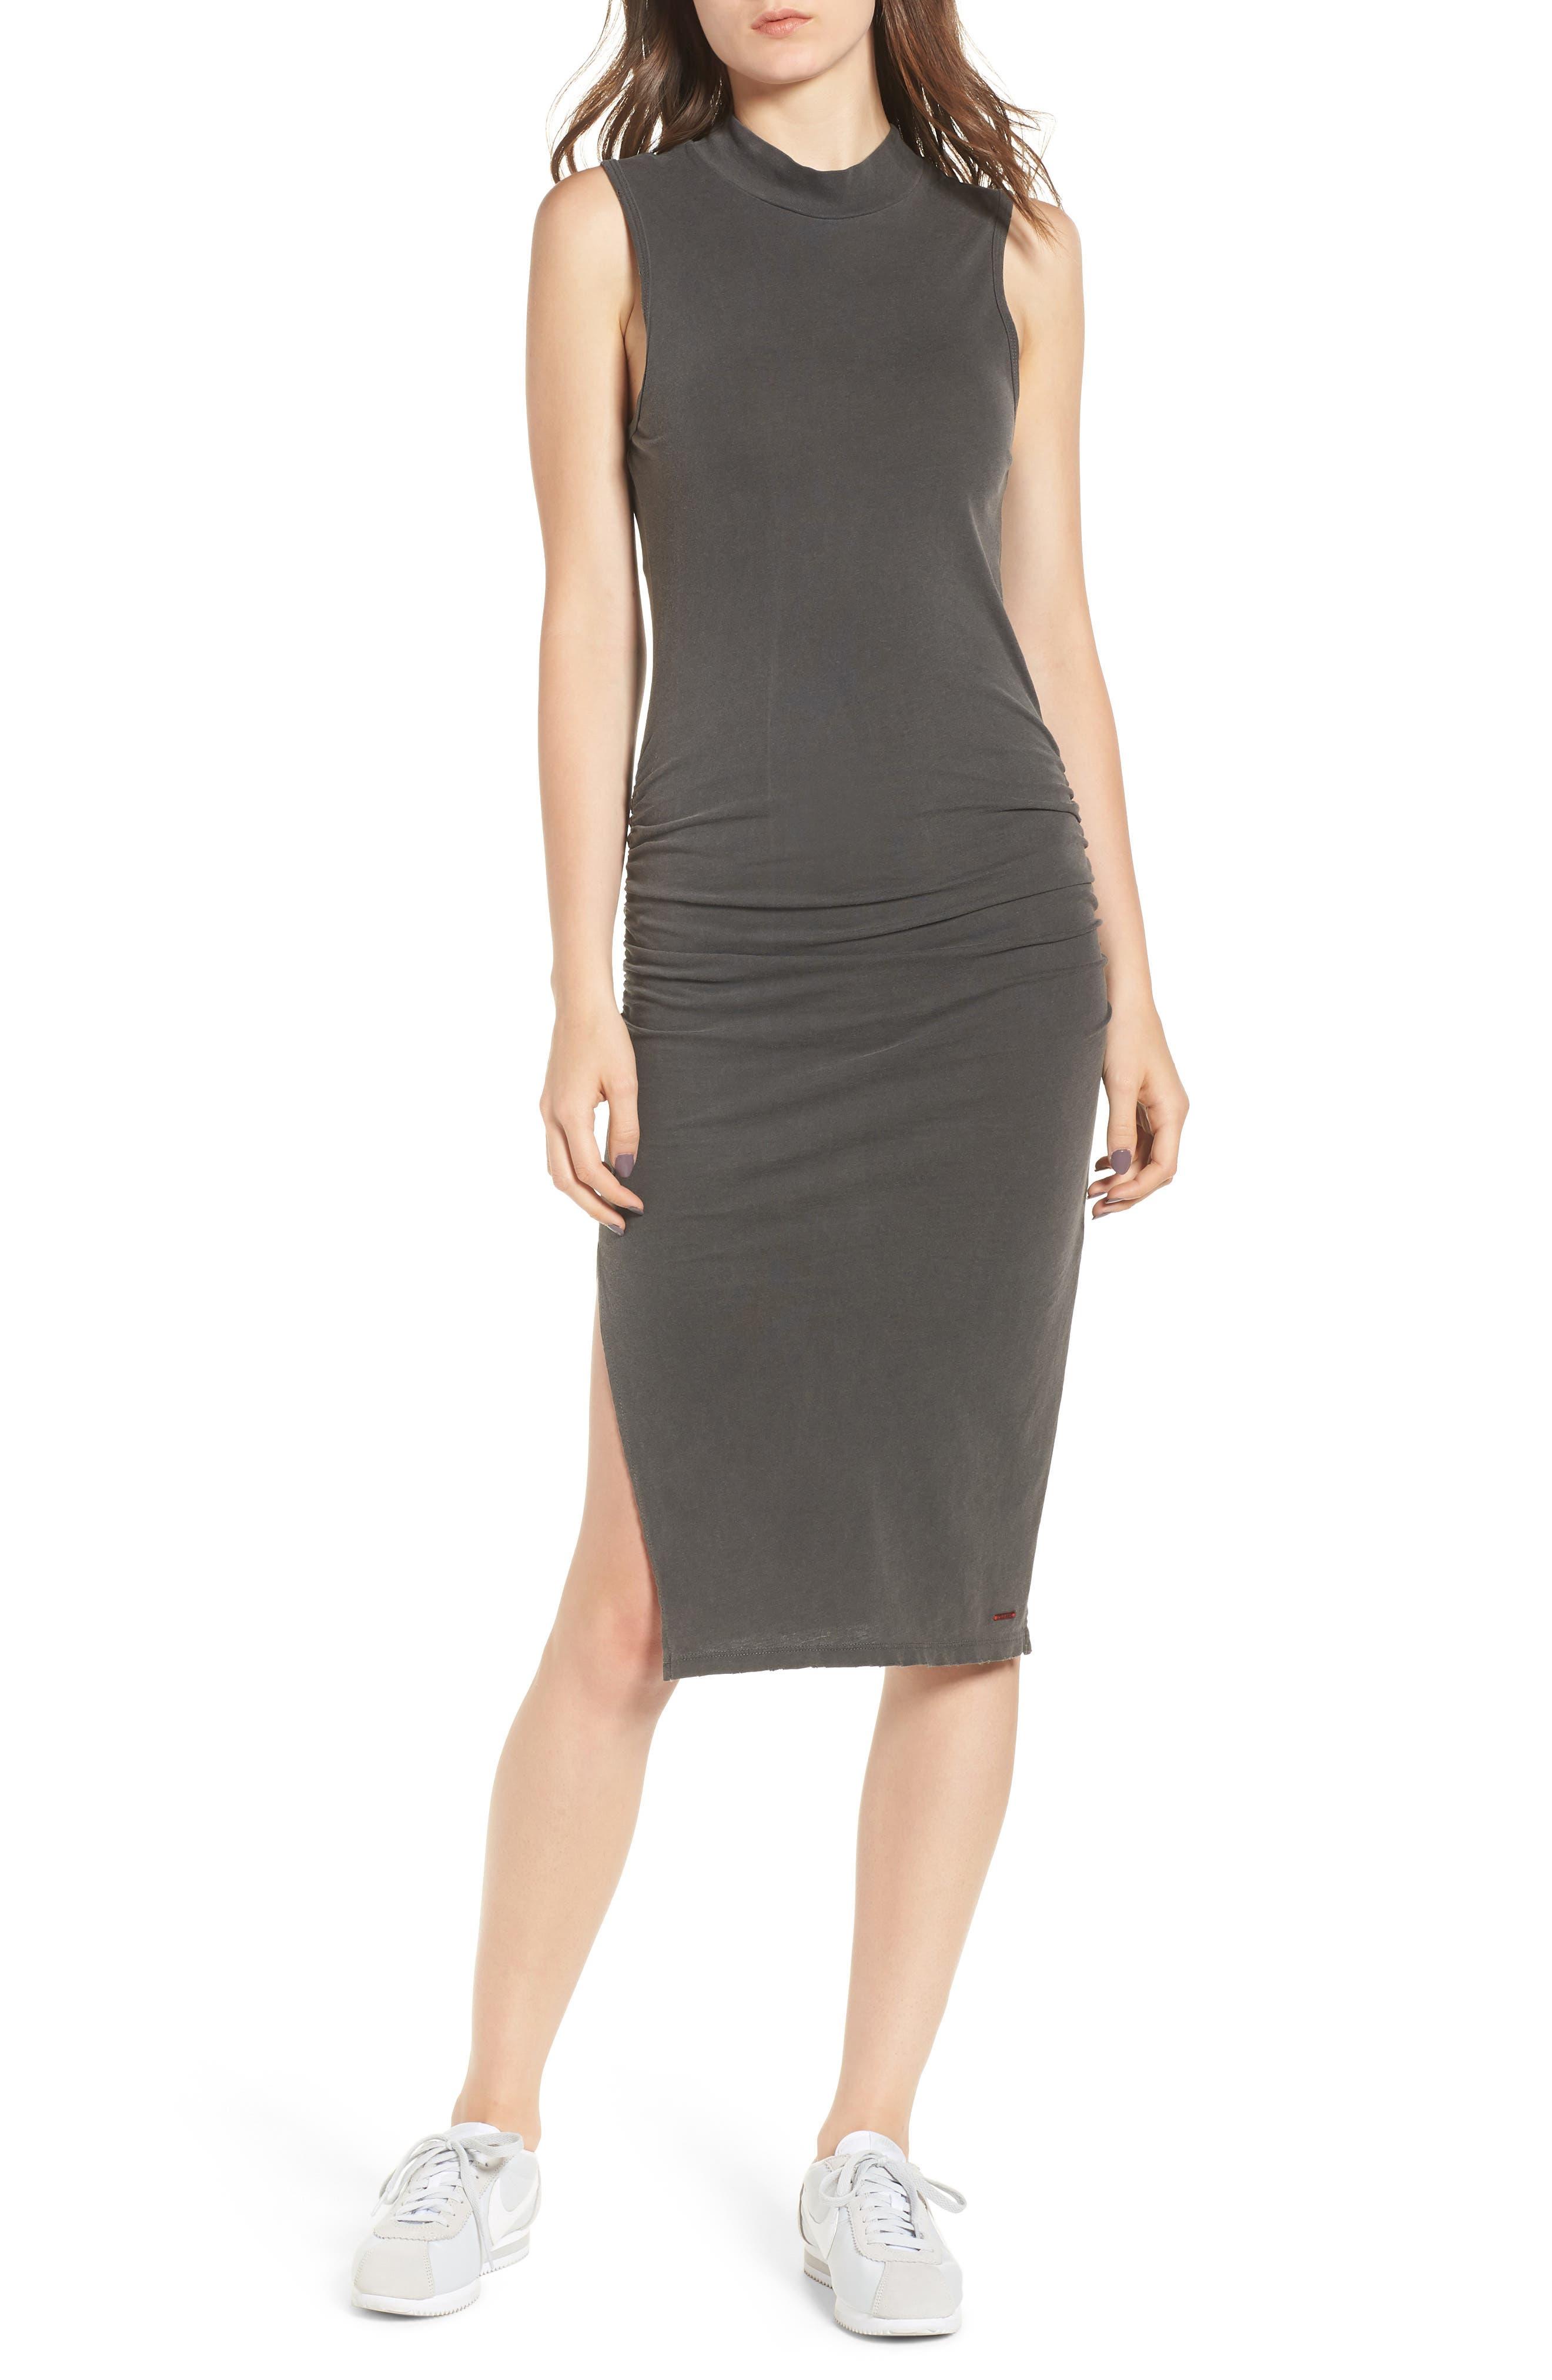 Womens Nphilanthropy Clothing Nordstrom Jolie Joie Midi Dress Nude L